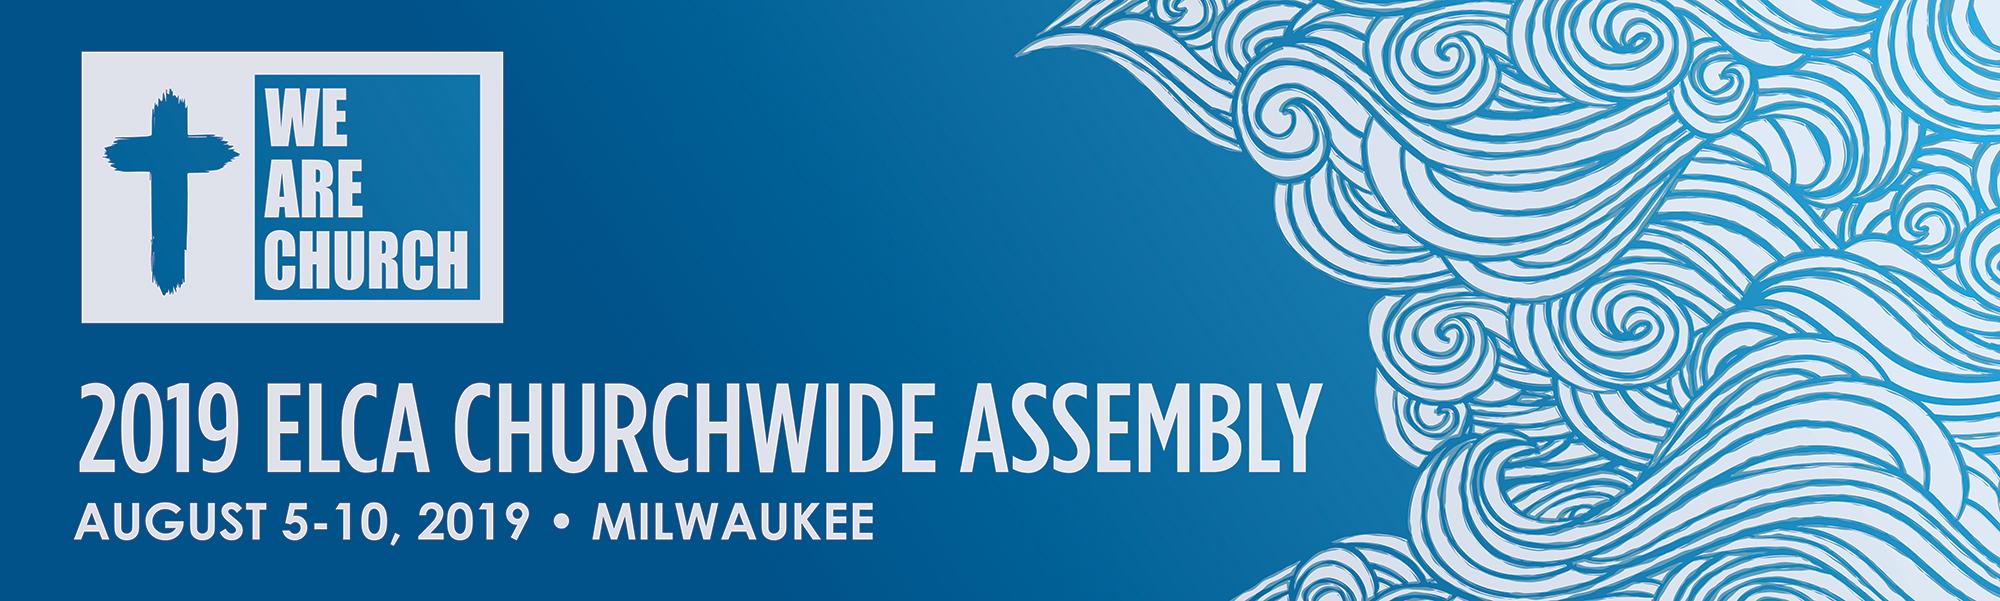 2019 ELCA Churchwide Assembly